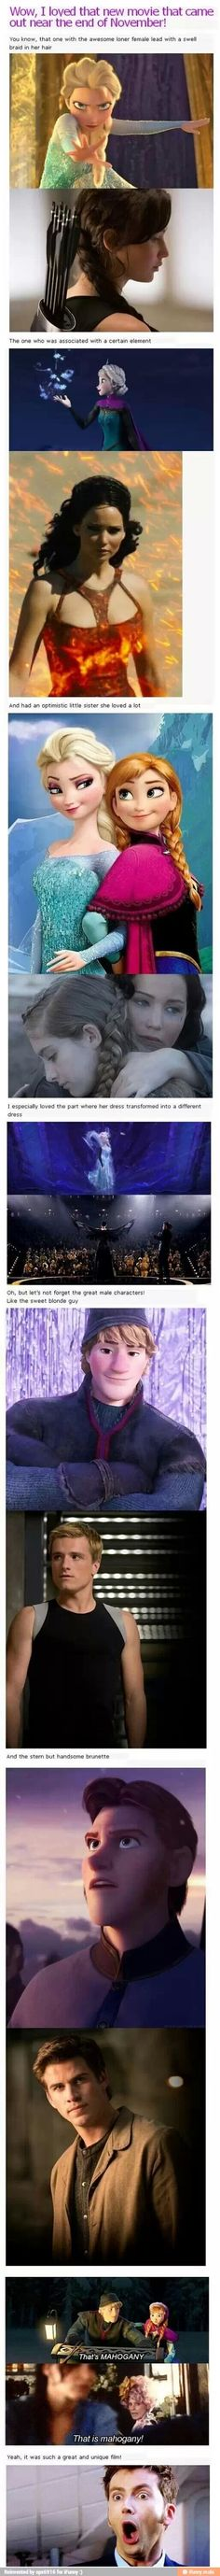 Yes!!! Disney Frozen!